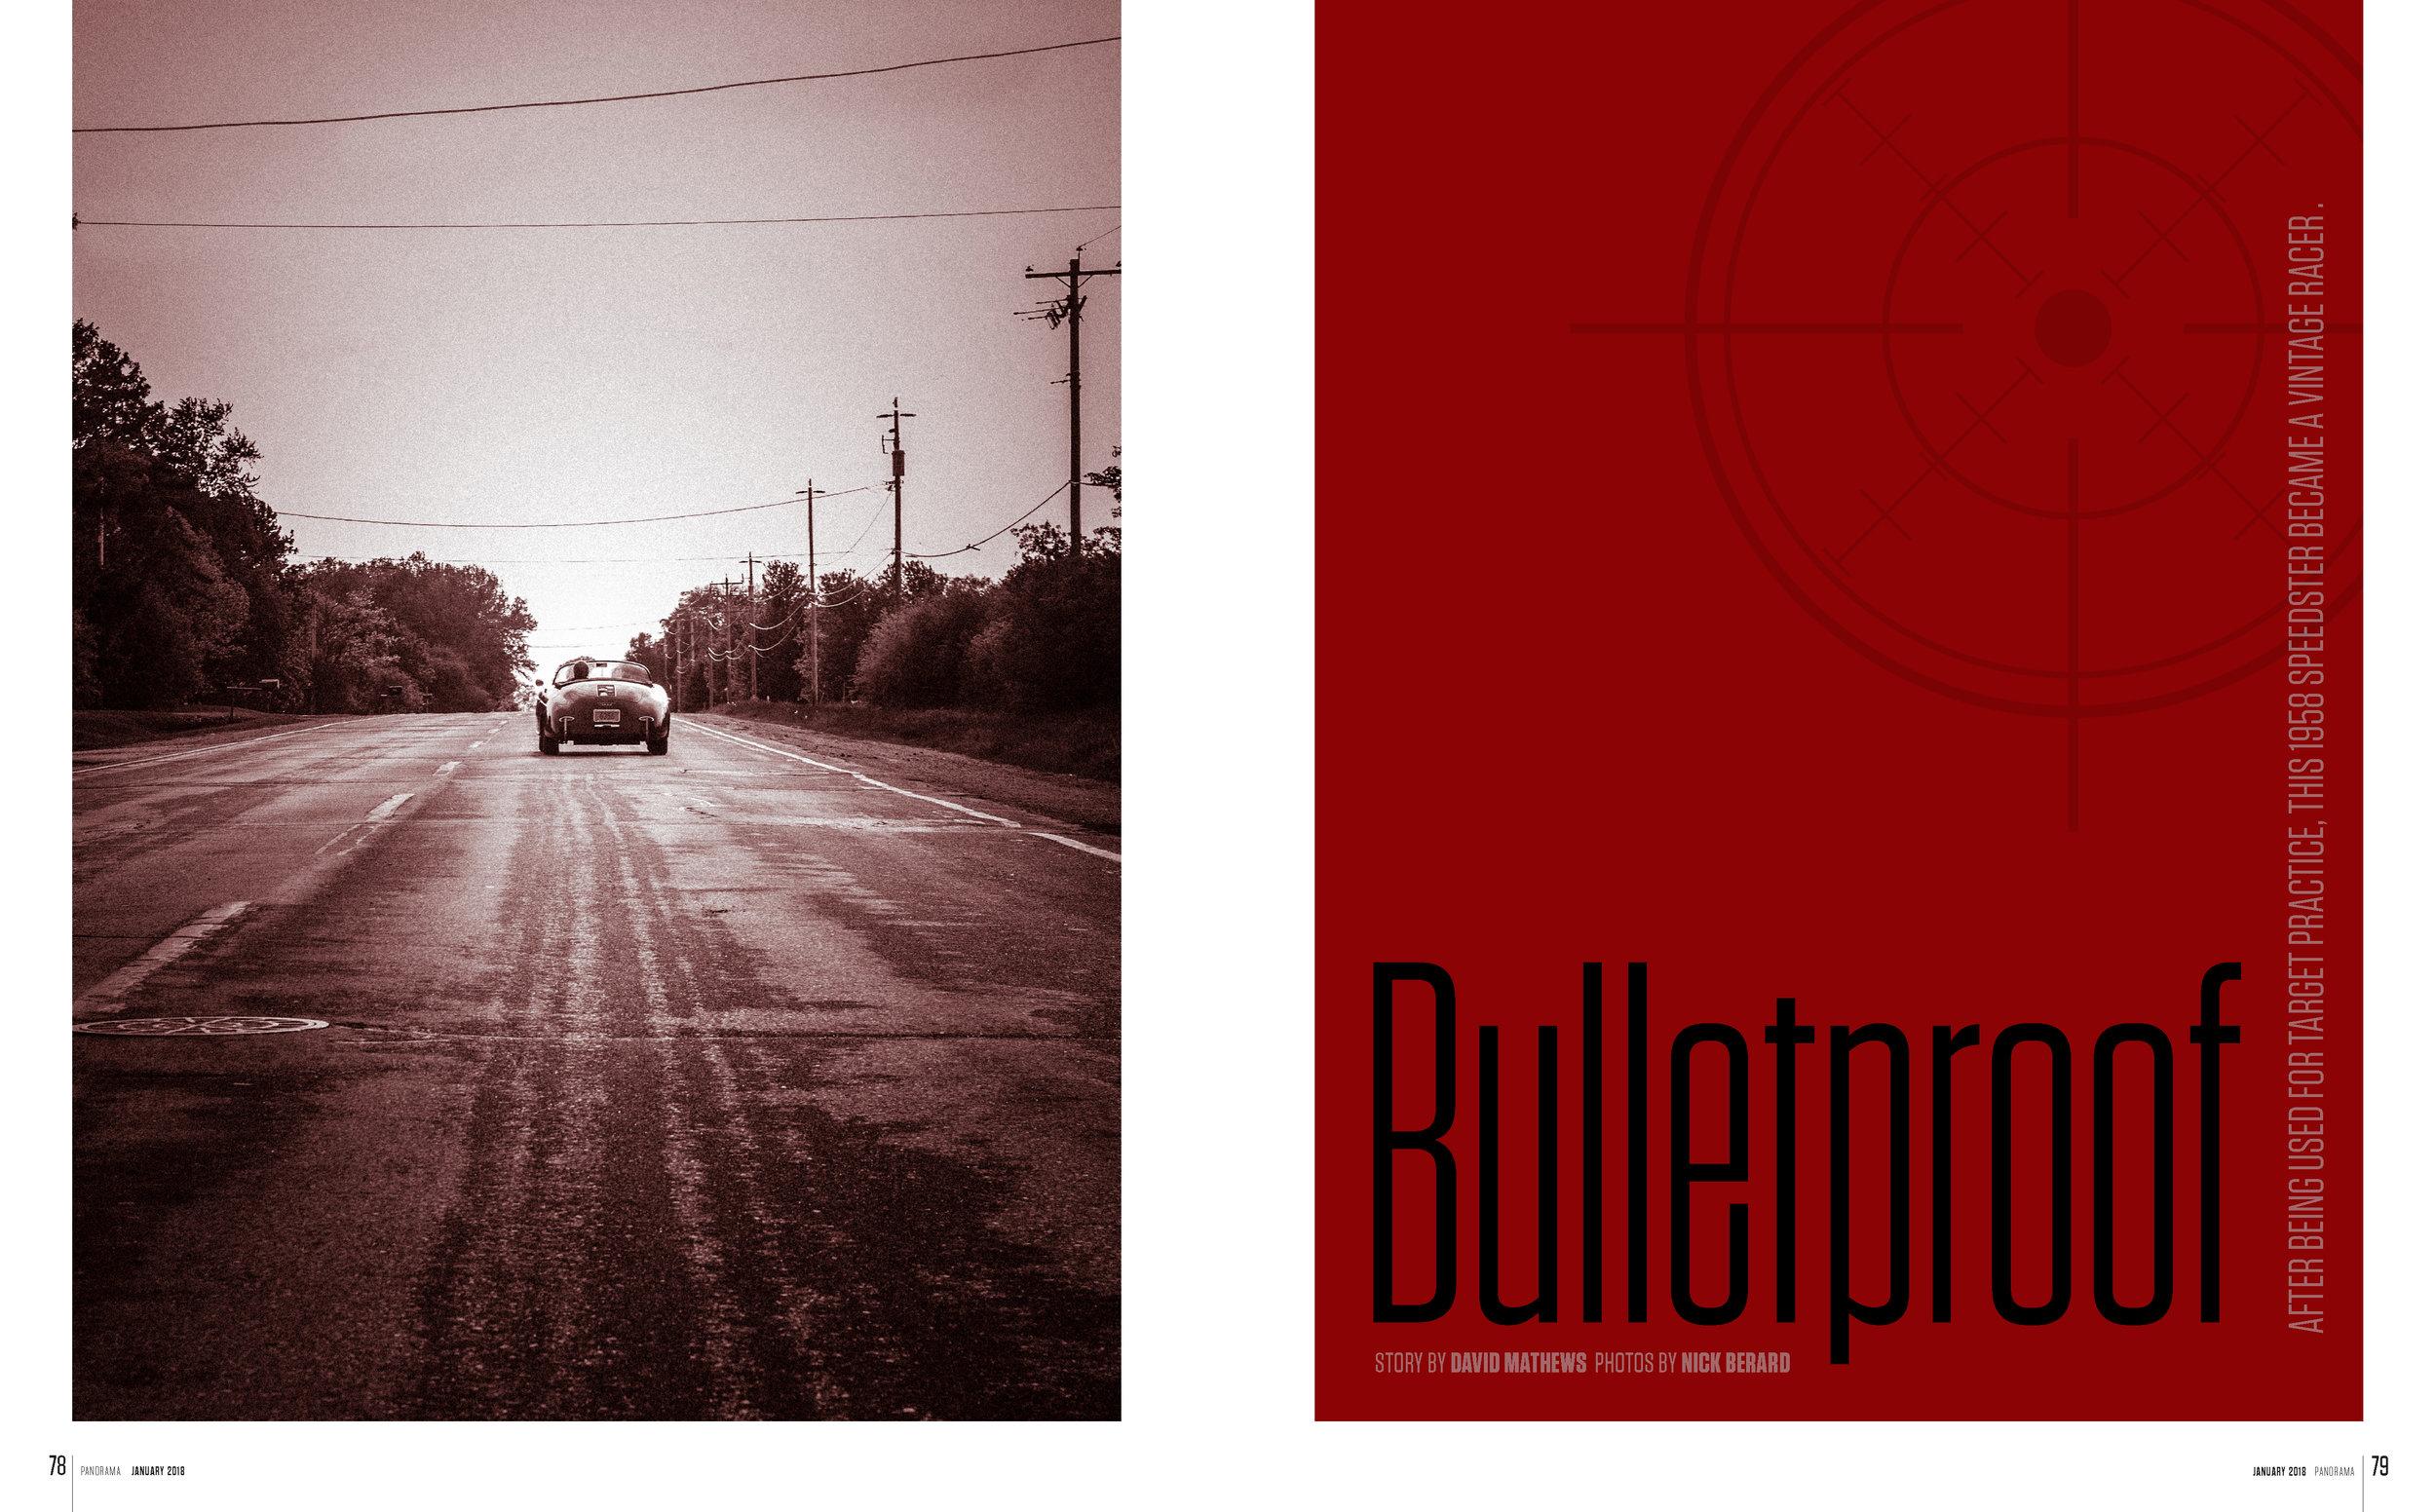 Porsche Panorama - Bullet Proof - FULL ARTICLE